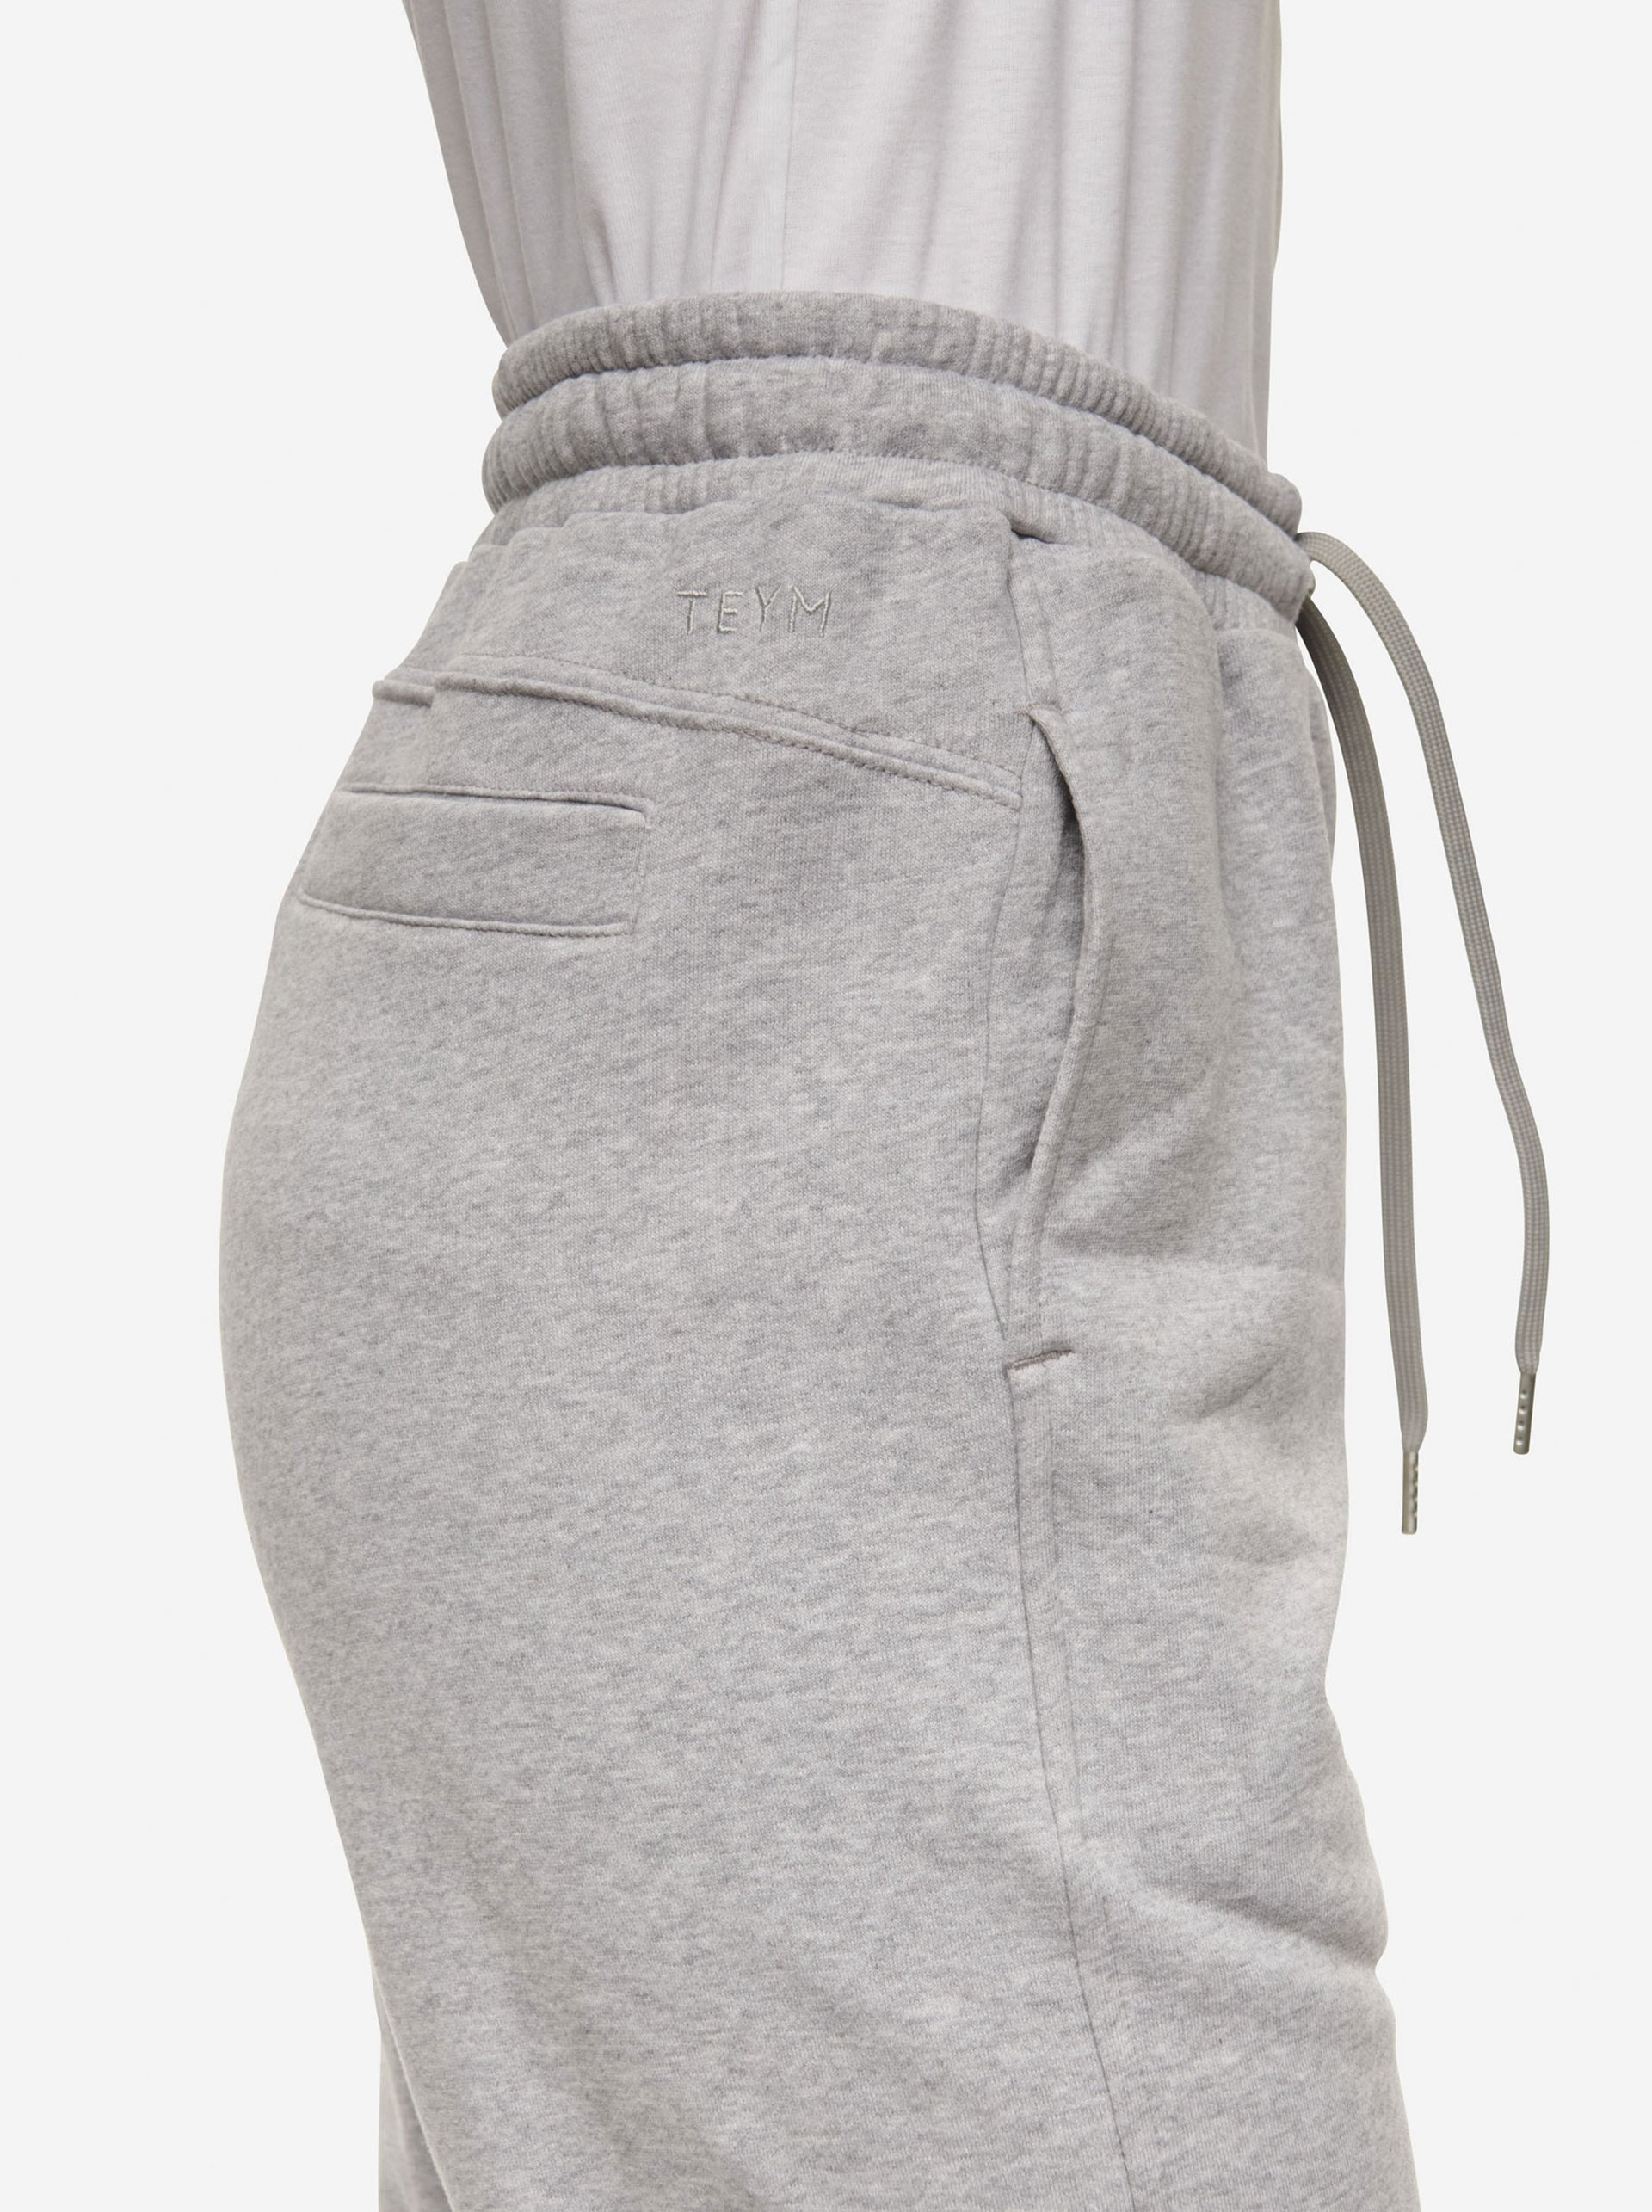 Teym-TheSweatpant-Women-Grey04